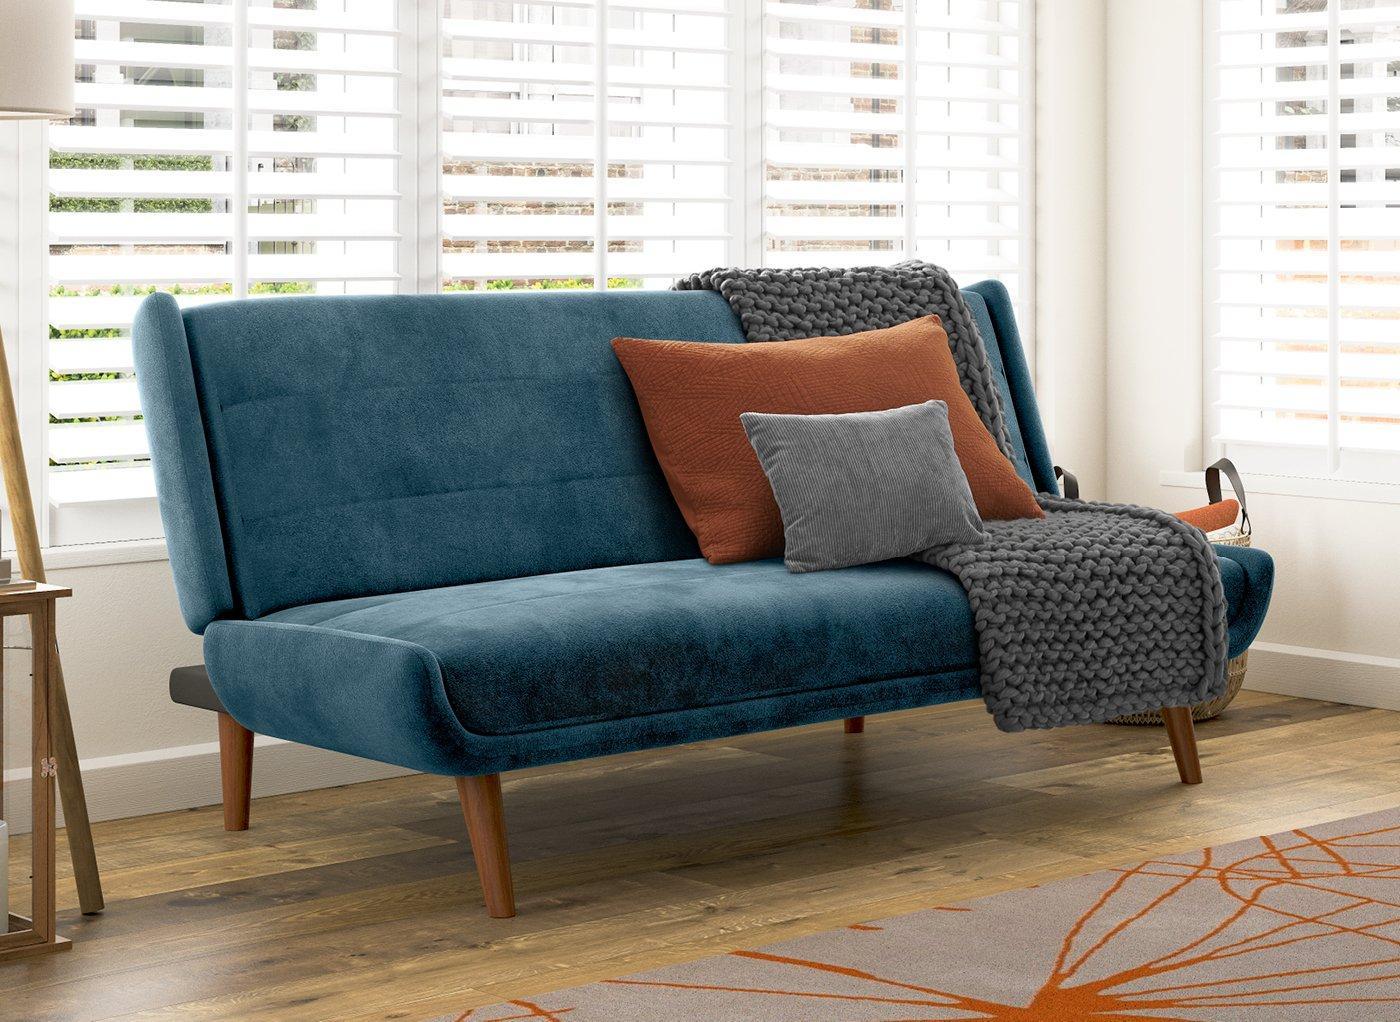 Ellery 3 Seater Velvet Clic-Clac Sofa Bed - Blue